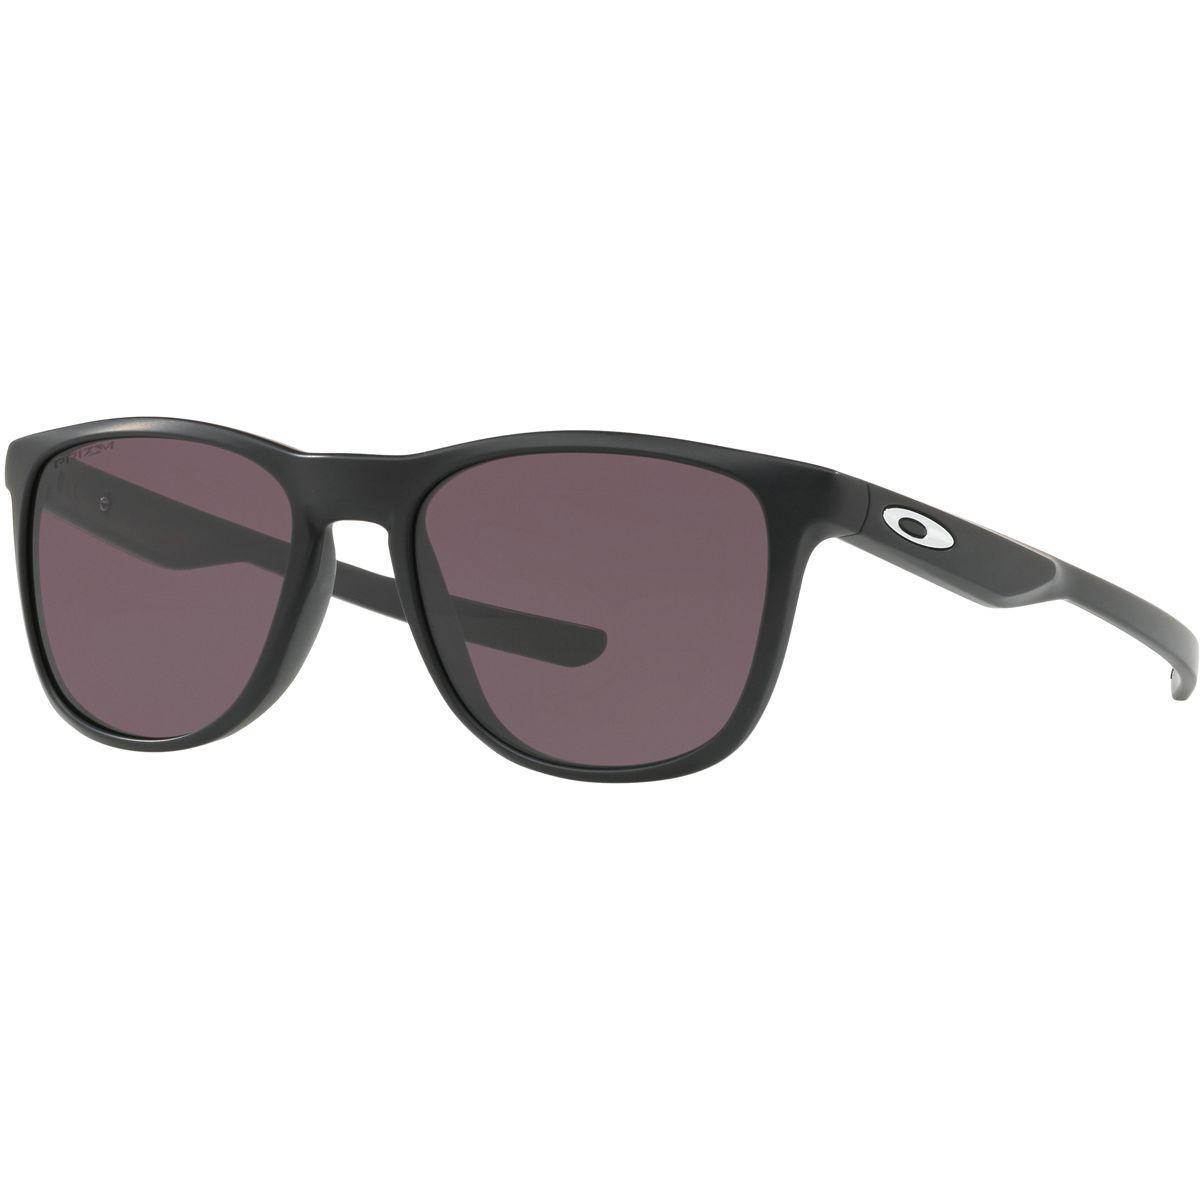 3146bff9b0 Lyst - Oakley Trillbe X Prizm Sunglasses in Gray for Men